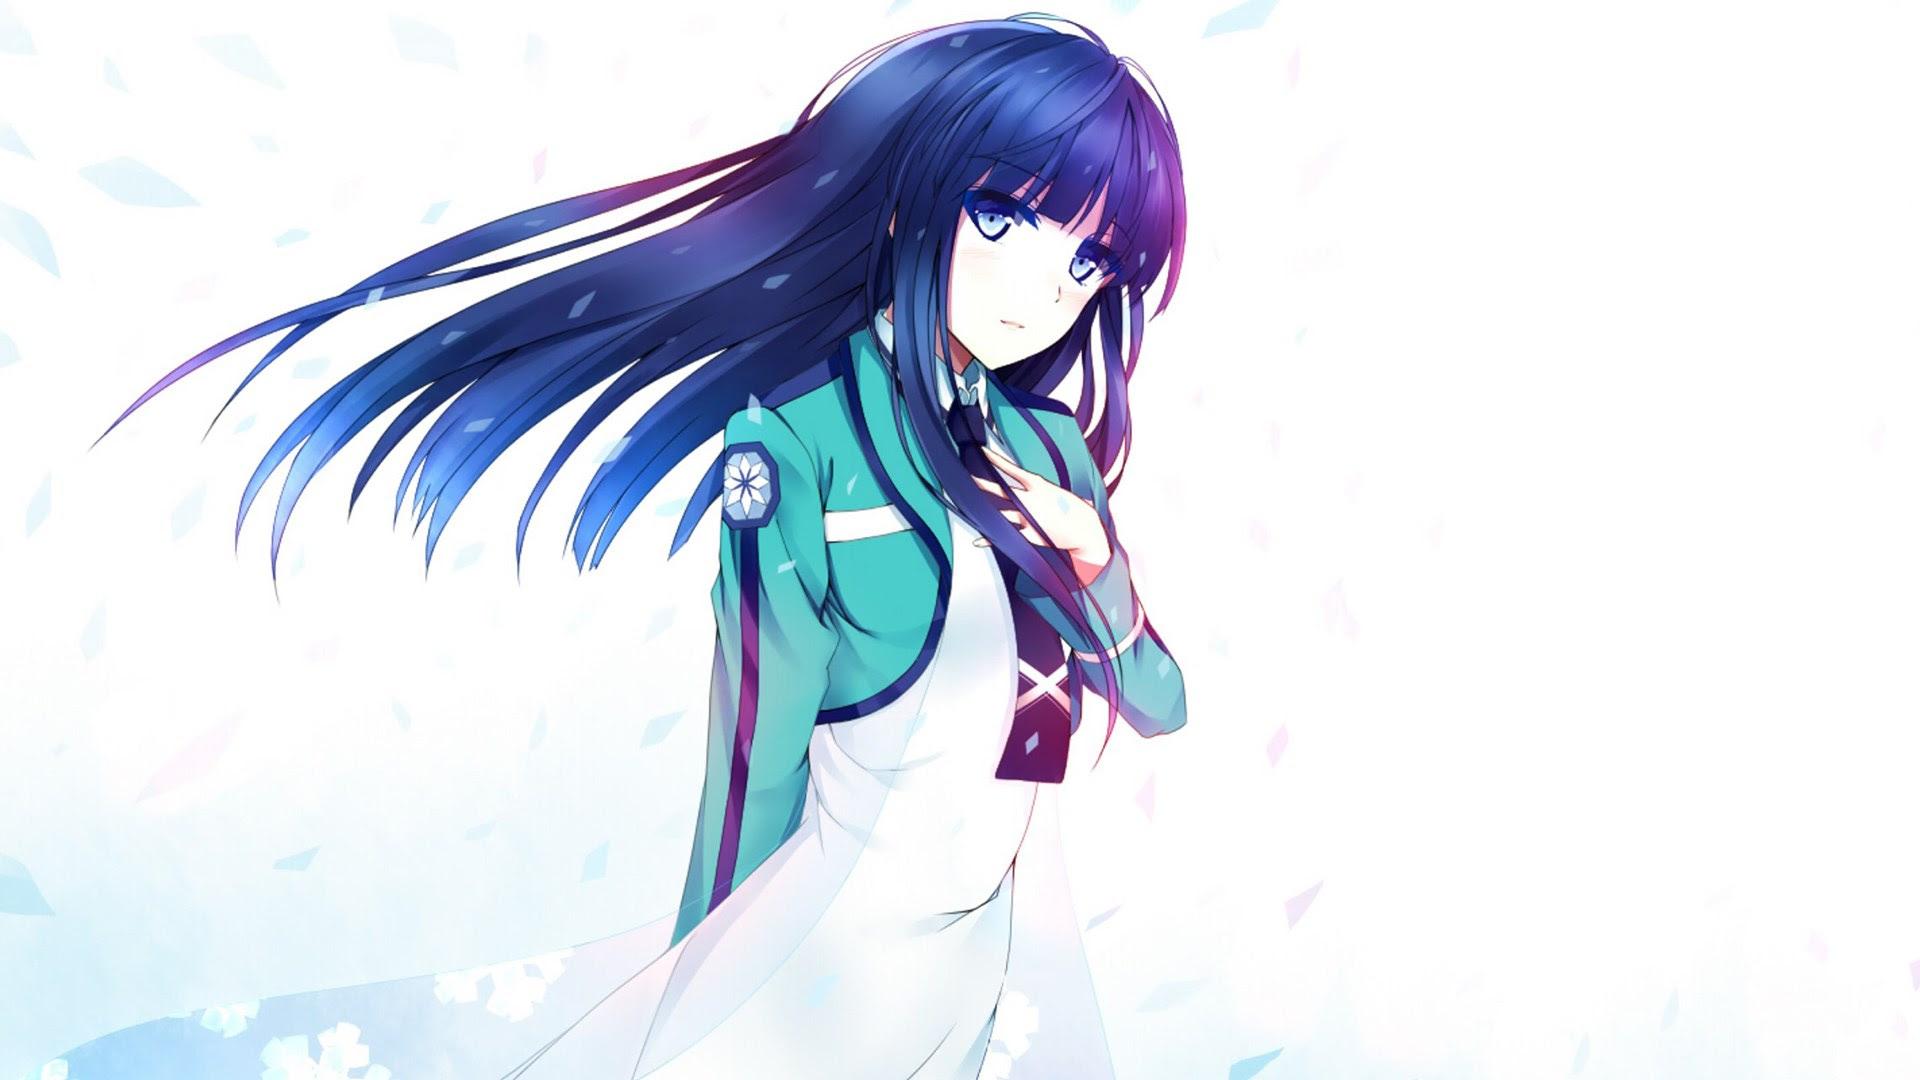 Theme Anime Anime High School Background